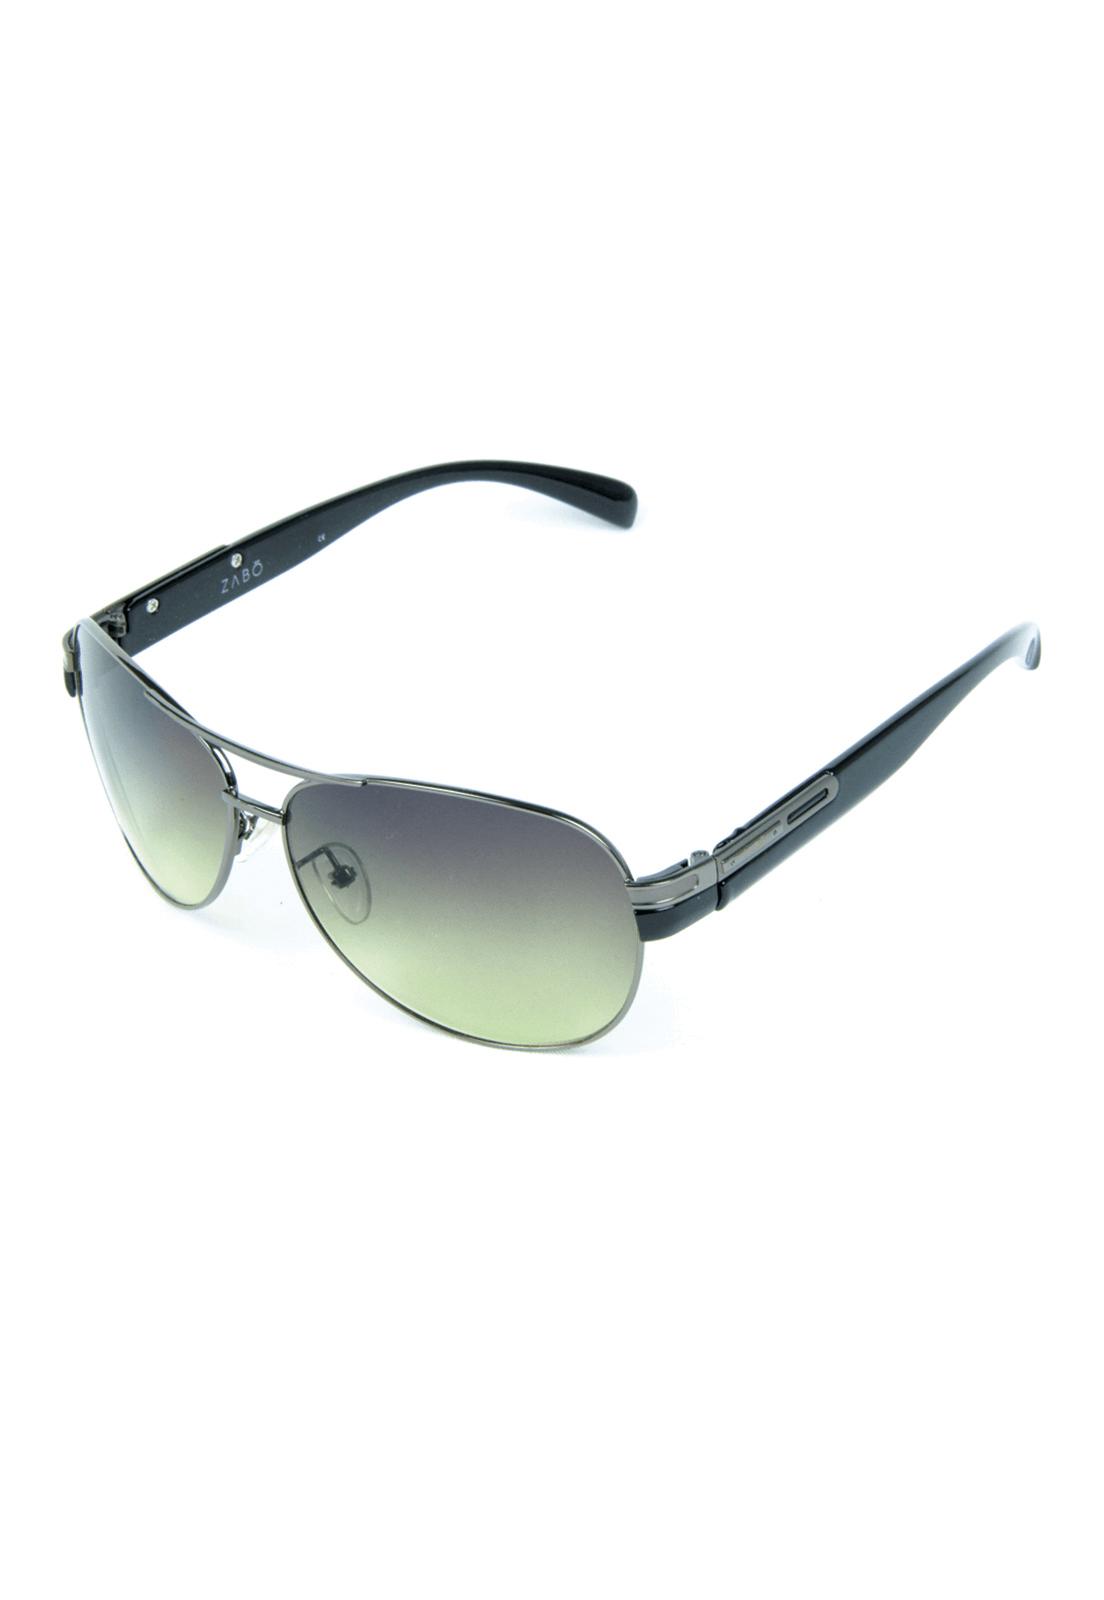 Óculos de Sol com Anti Reflexo em Metal Zabô Dublin Chumbo